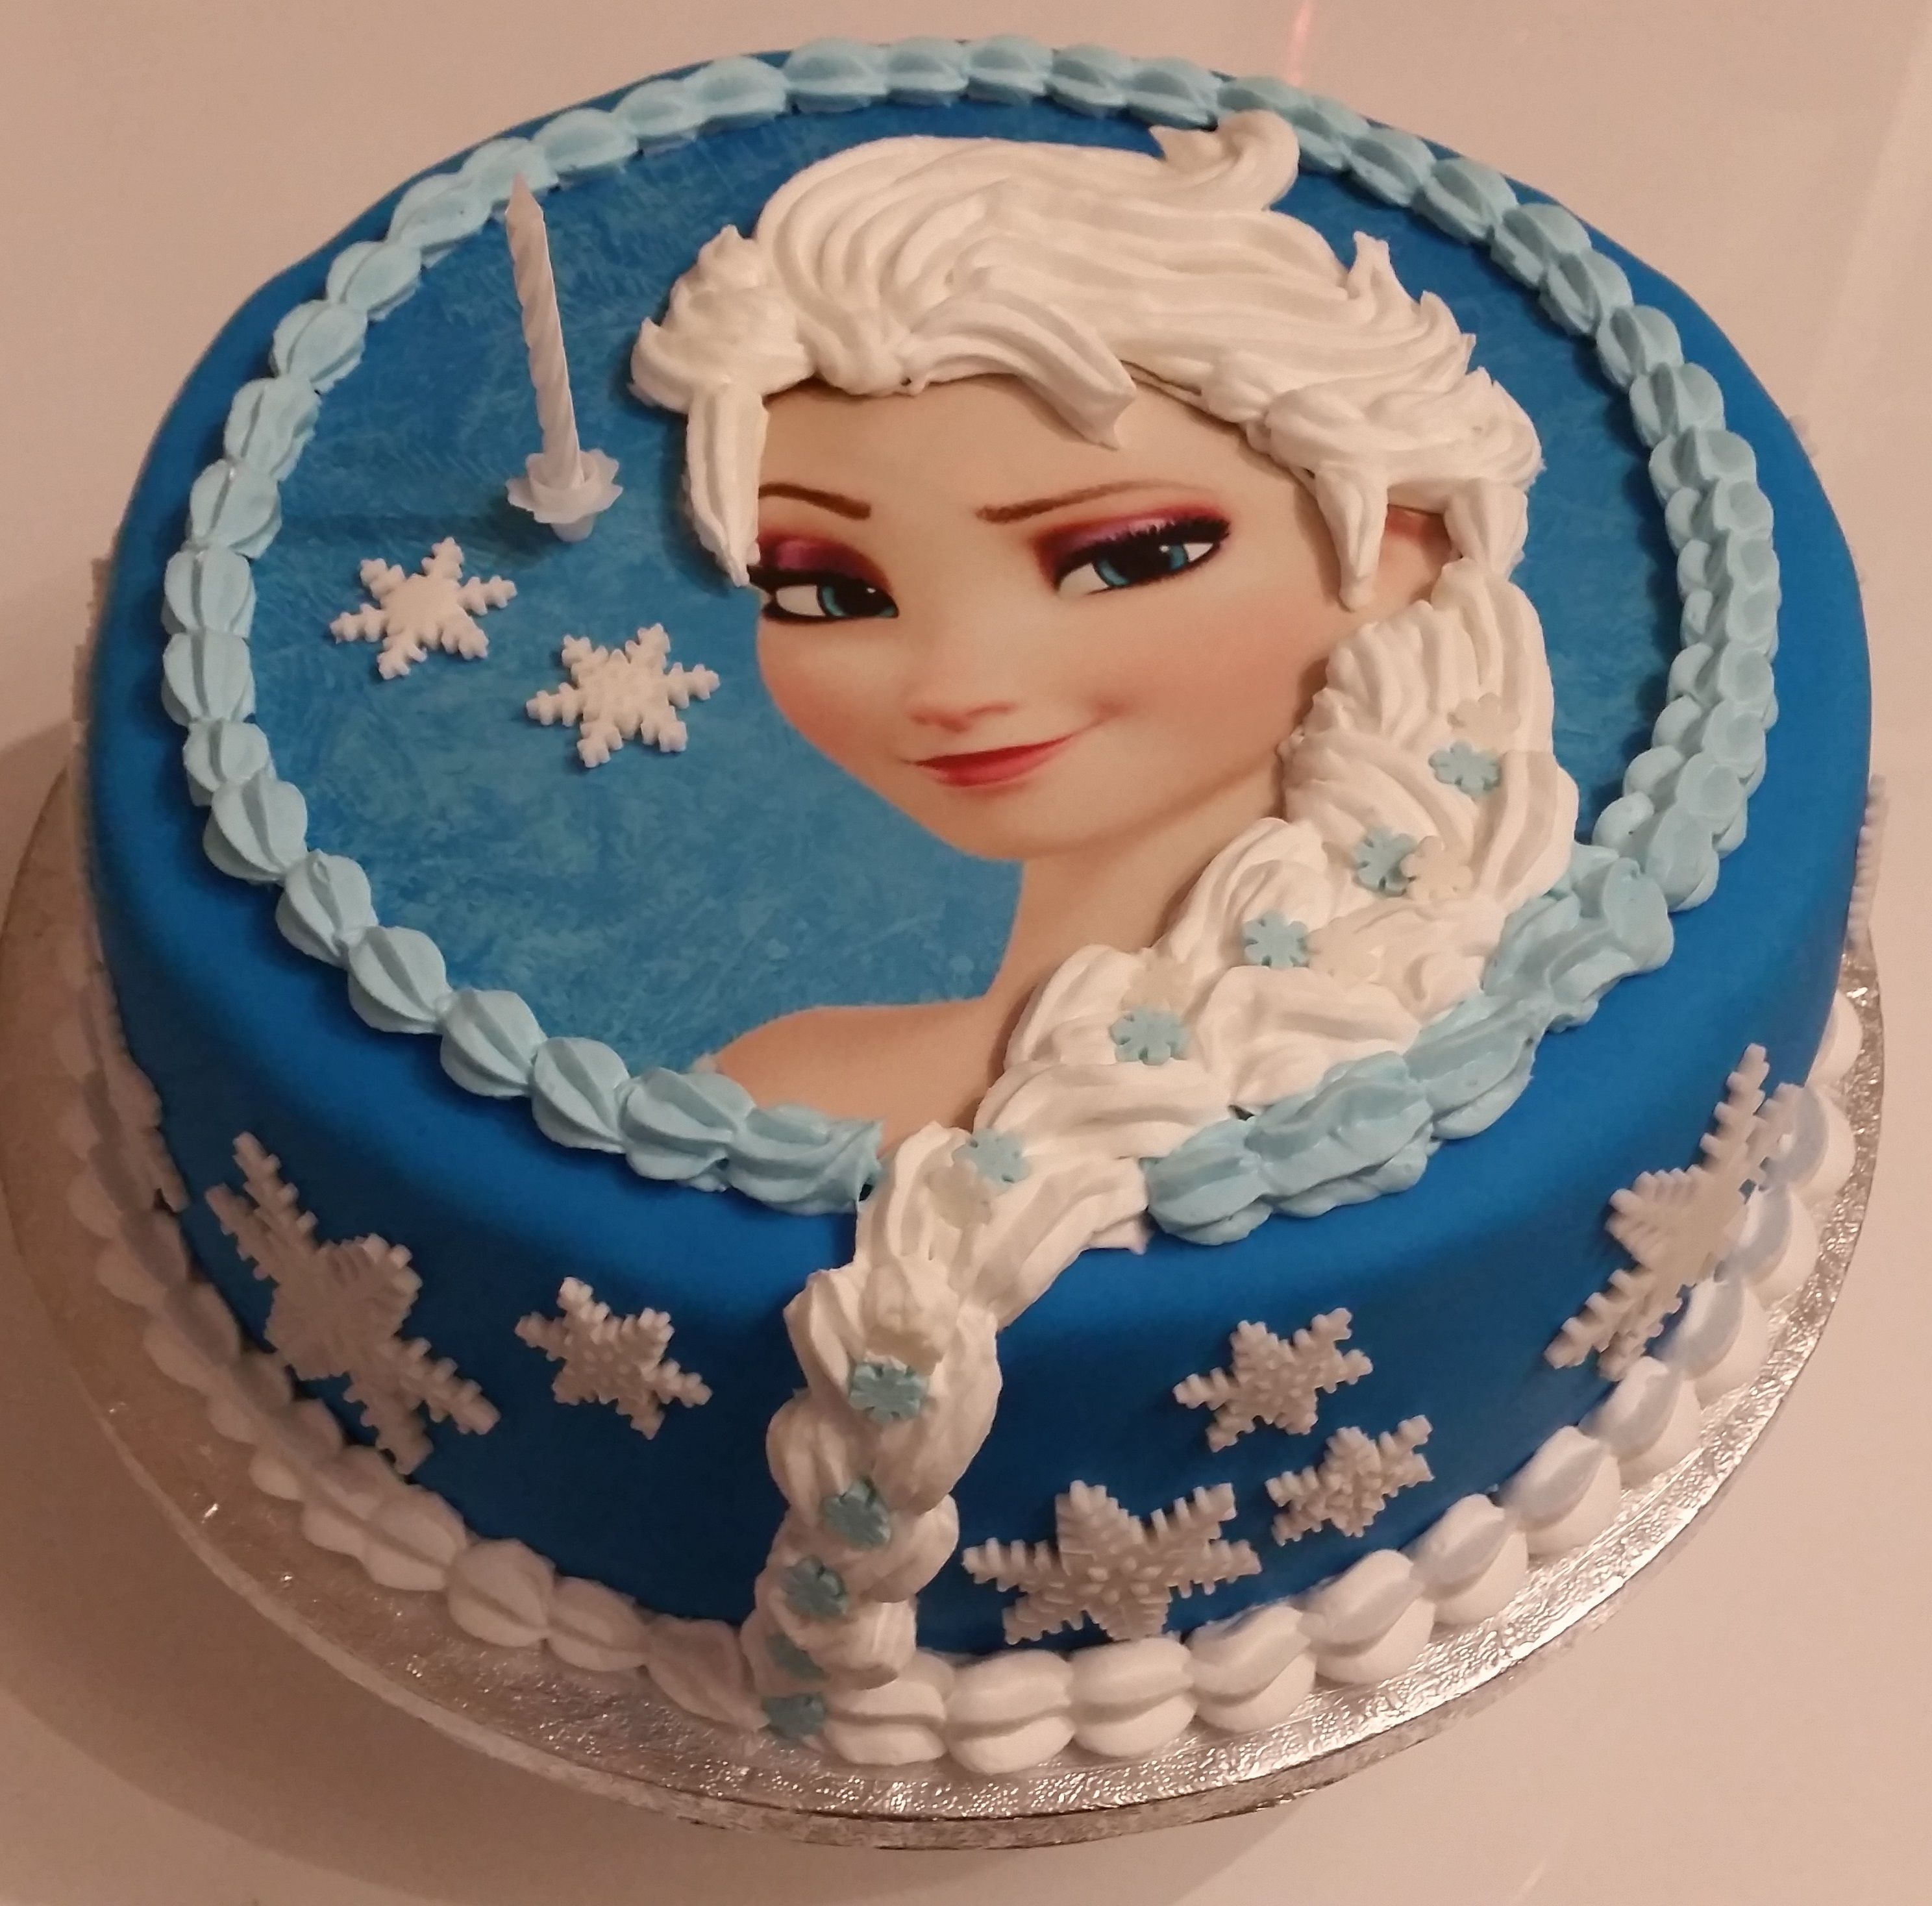 elsa torte frozen die eisk nigin emilie pinterest elsa cake and birthday cakes. Black Bedroom Furniture Sets. Home Design Ideas